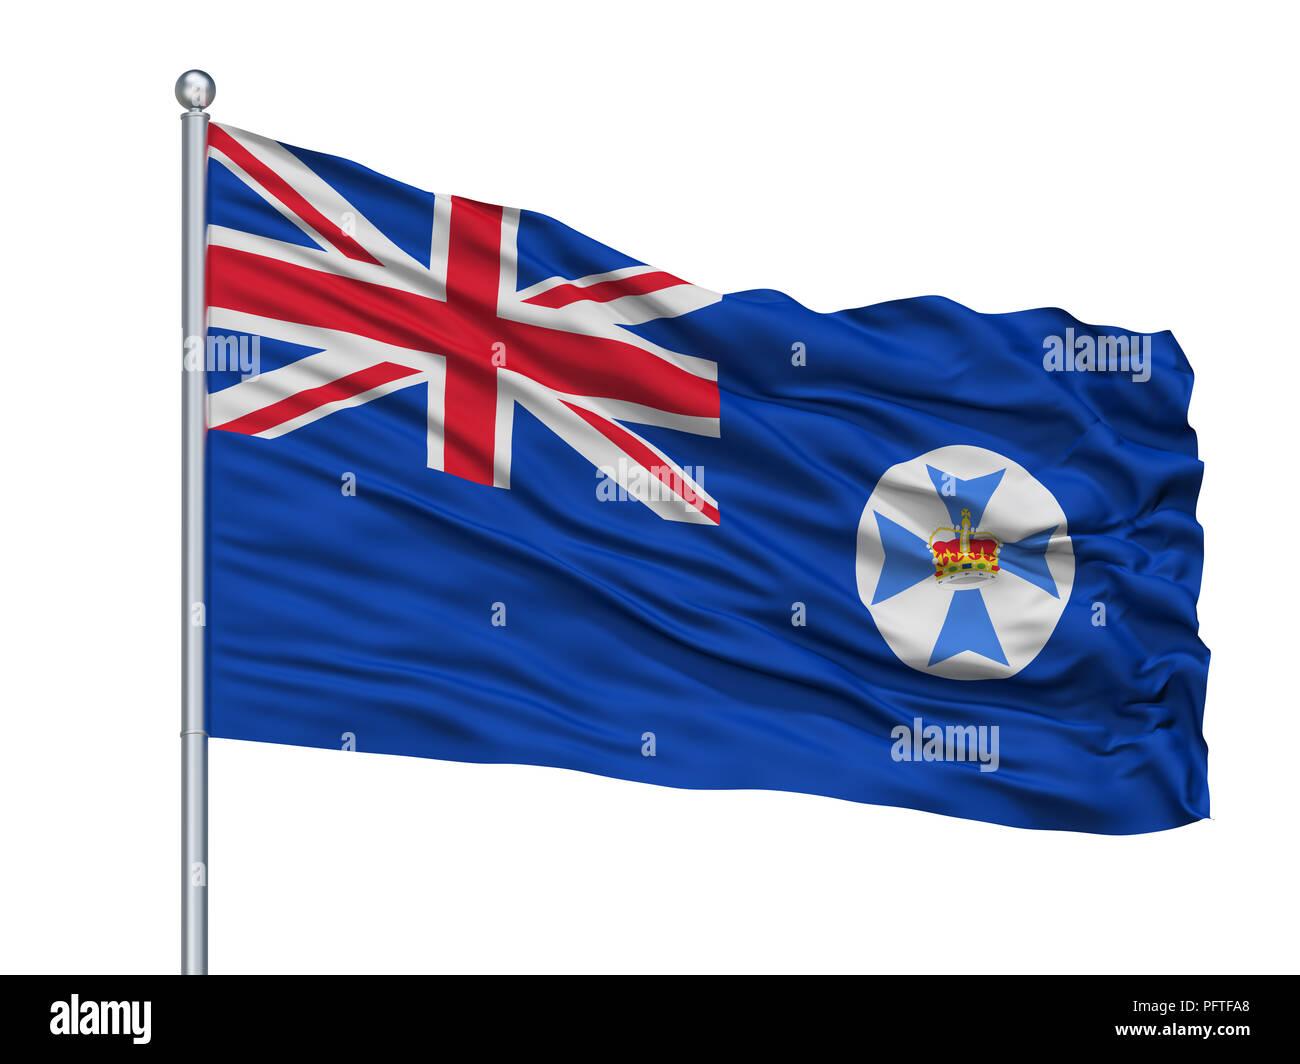 Queensland City Flag On Flagpole, Australia, Isolated On White Background - Stock Image